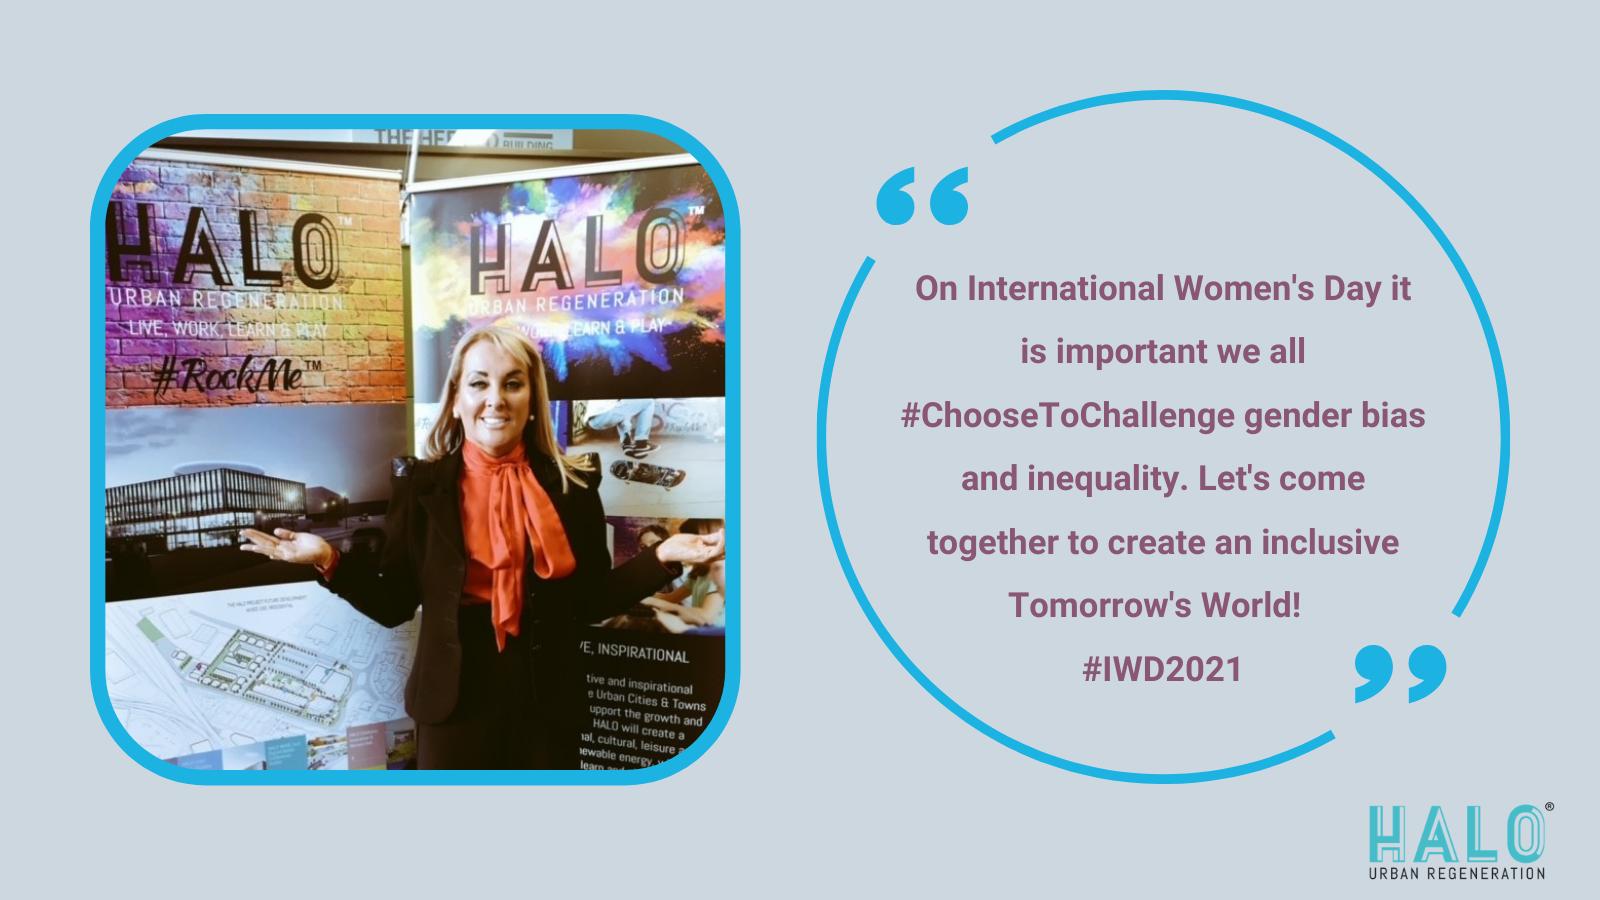 International Women's Day 2021: #ChooseToChallenge